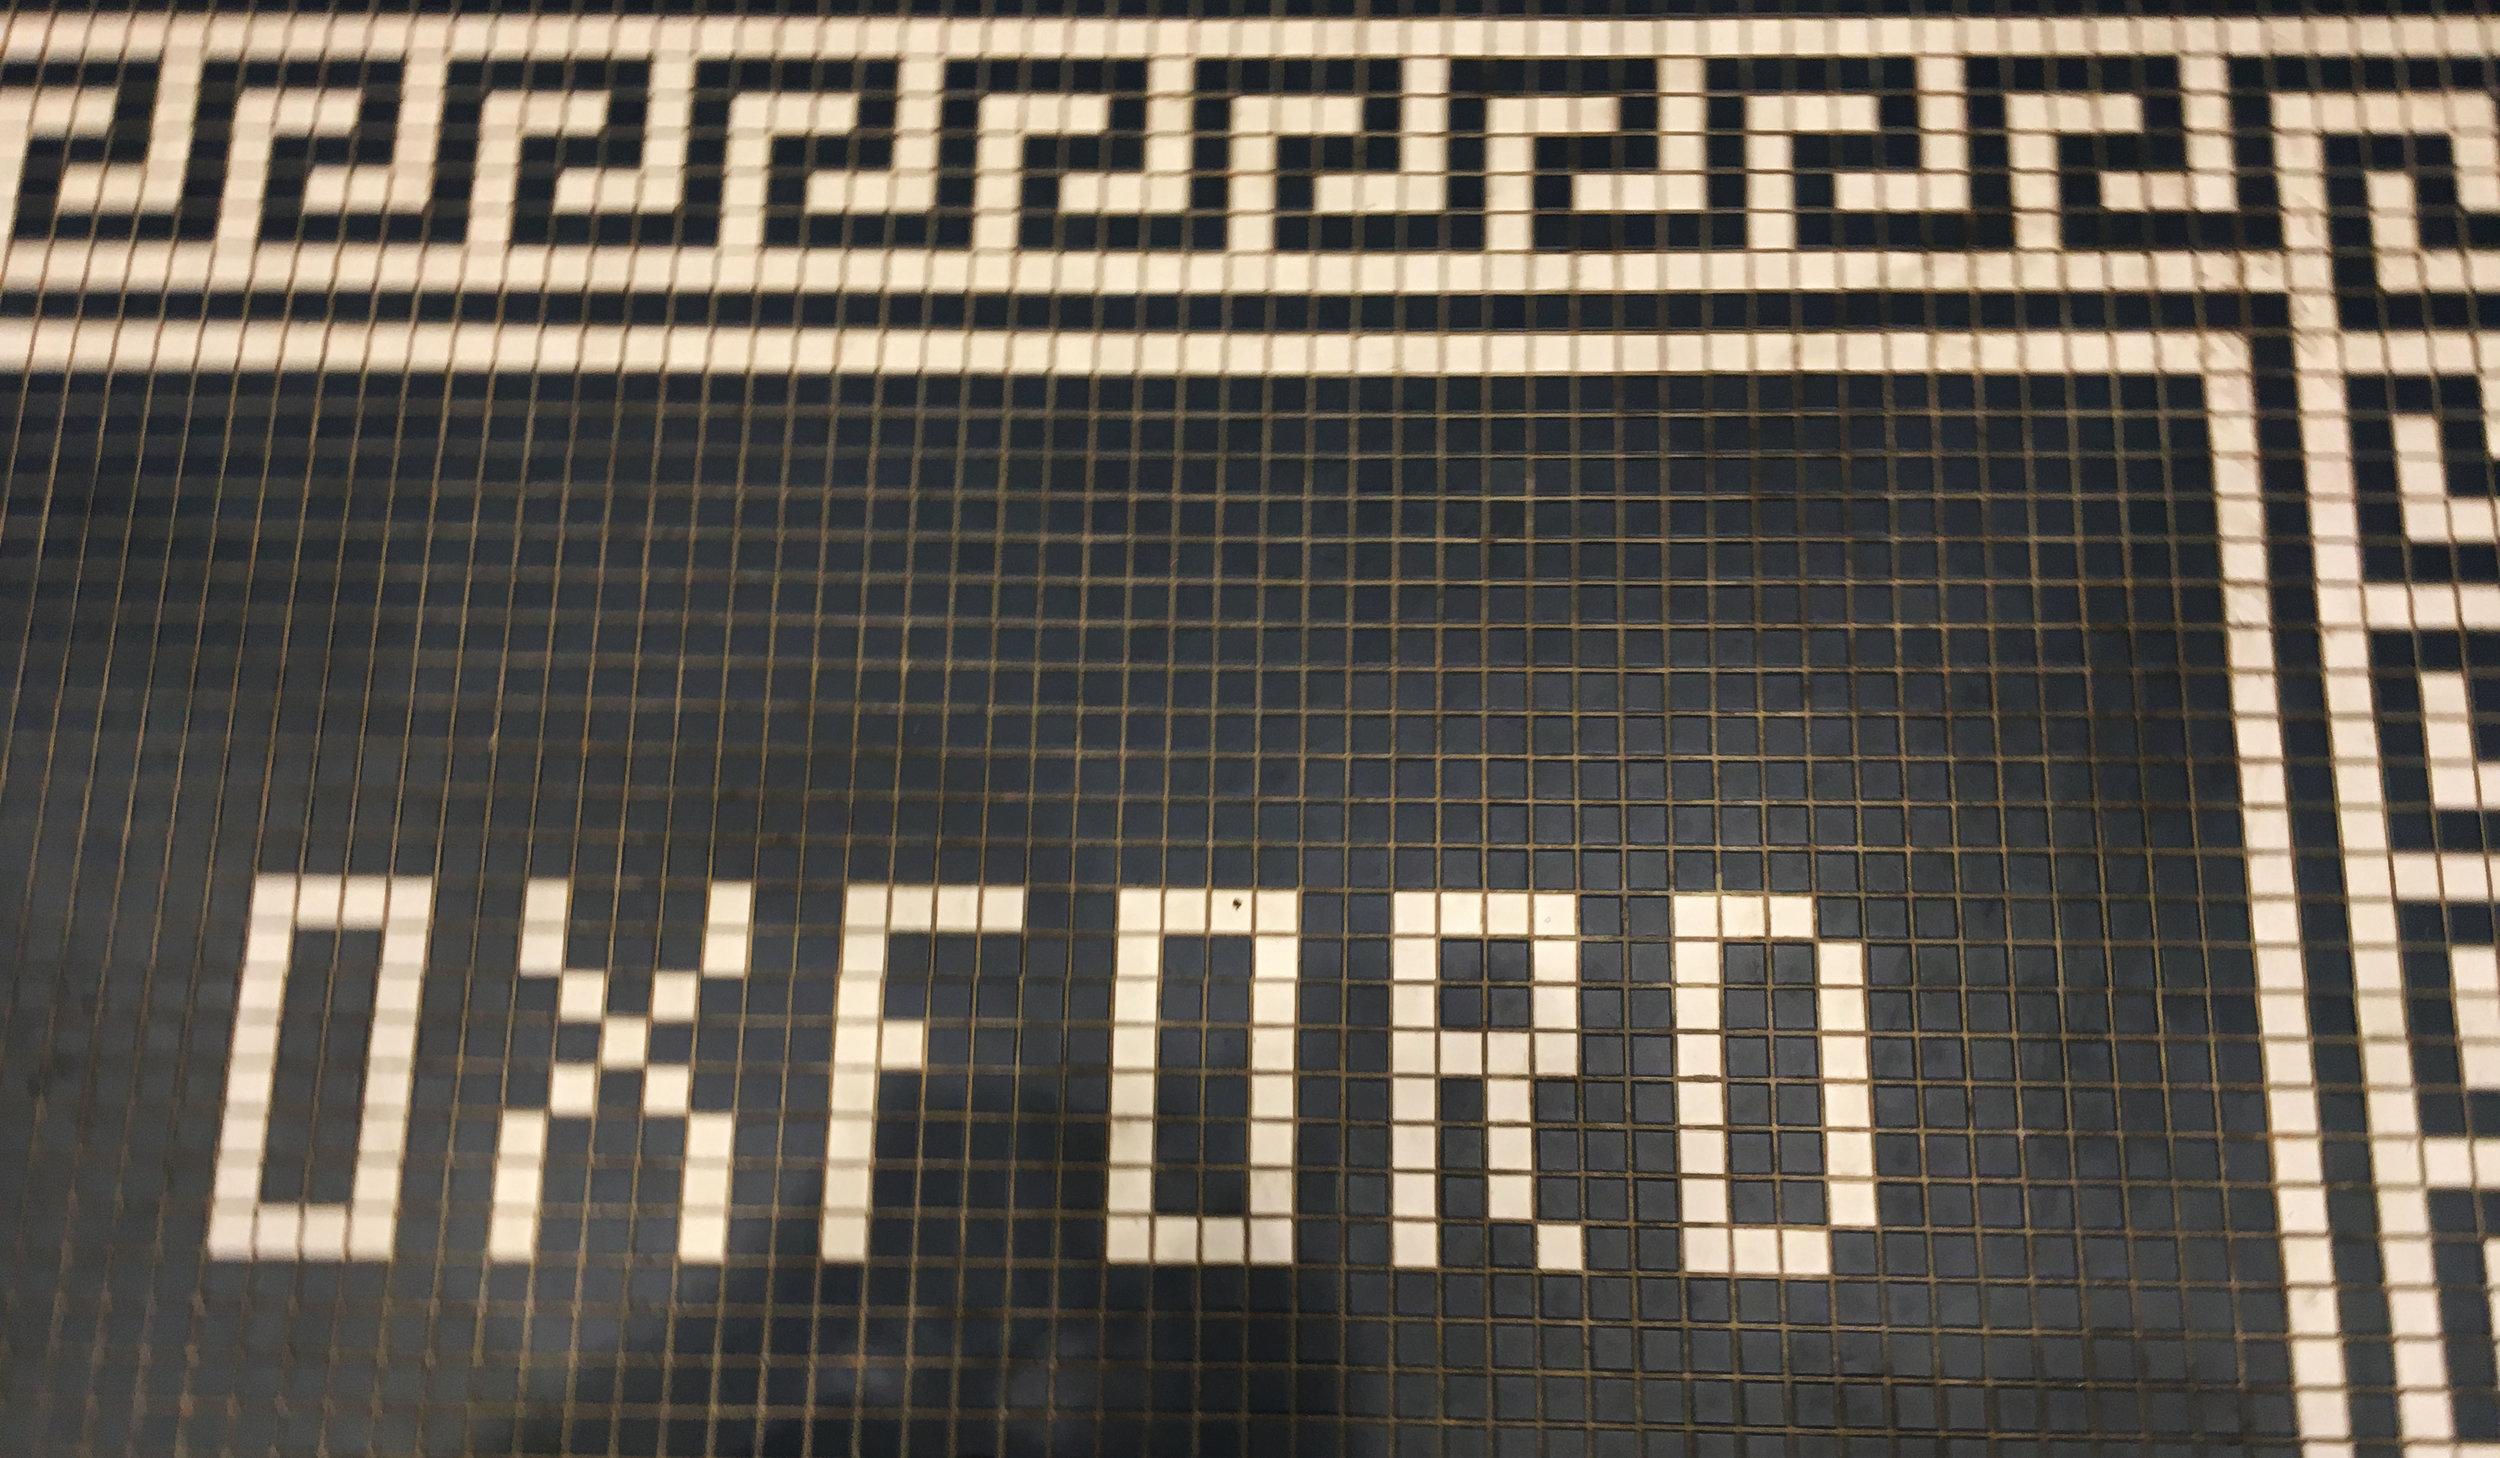 Oxford MS tile floor inlay 01.JPG